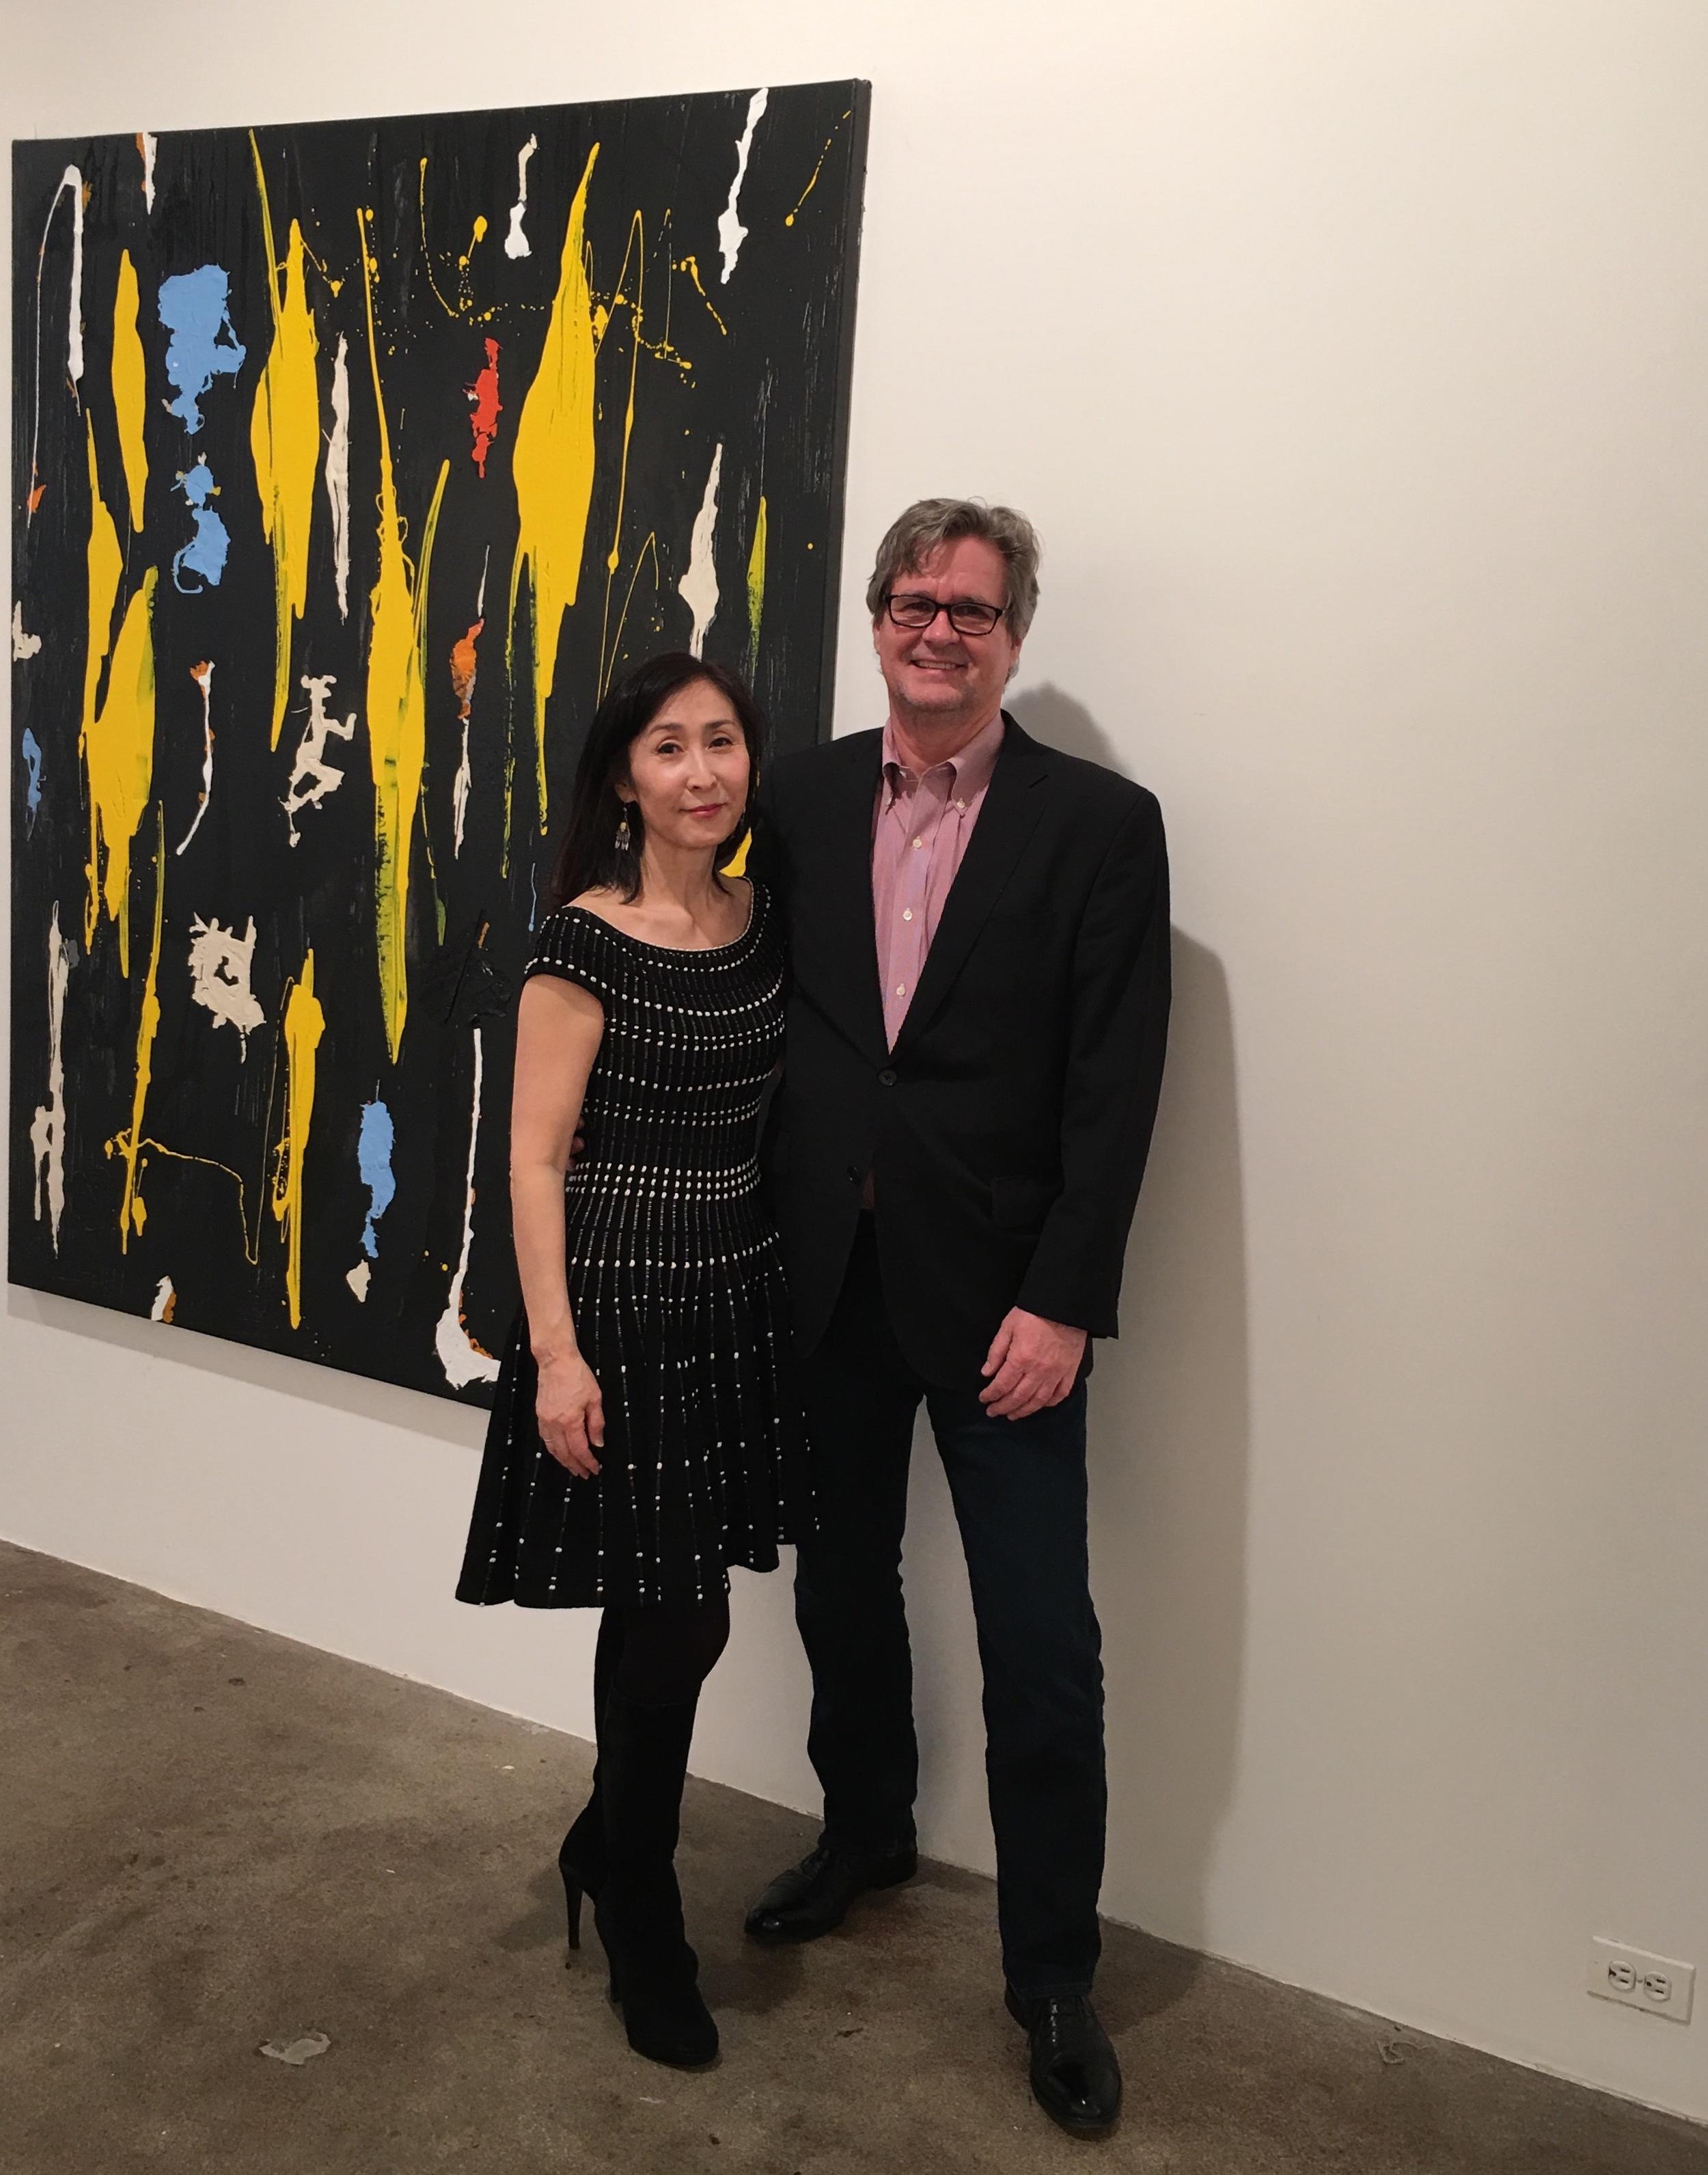 Ayn S Choi, David Goerk